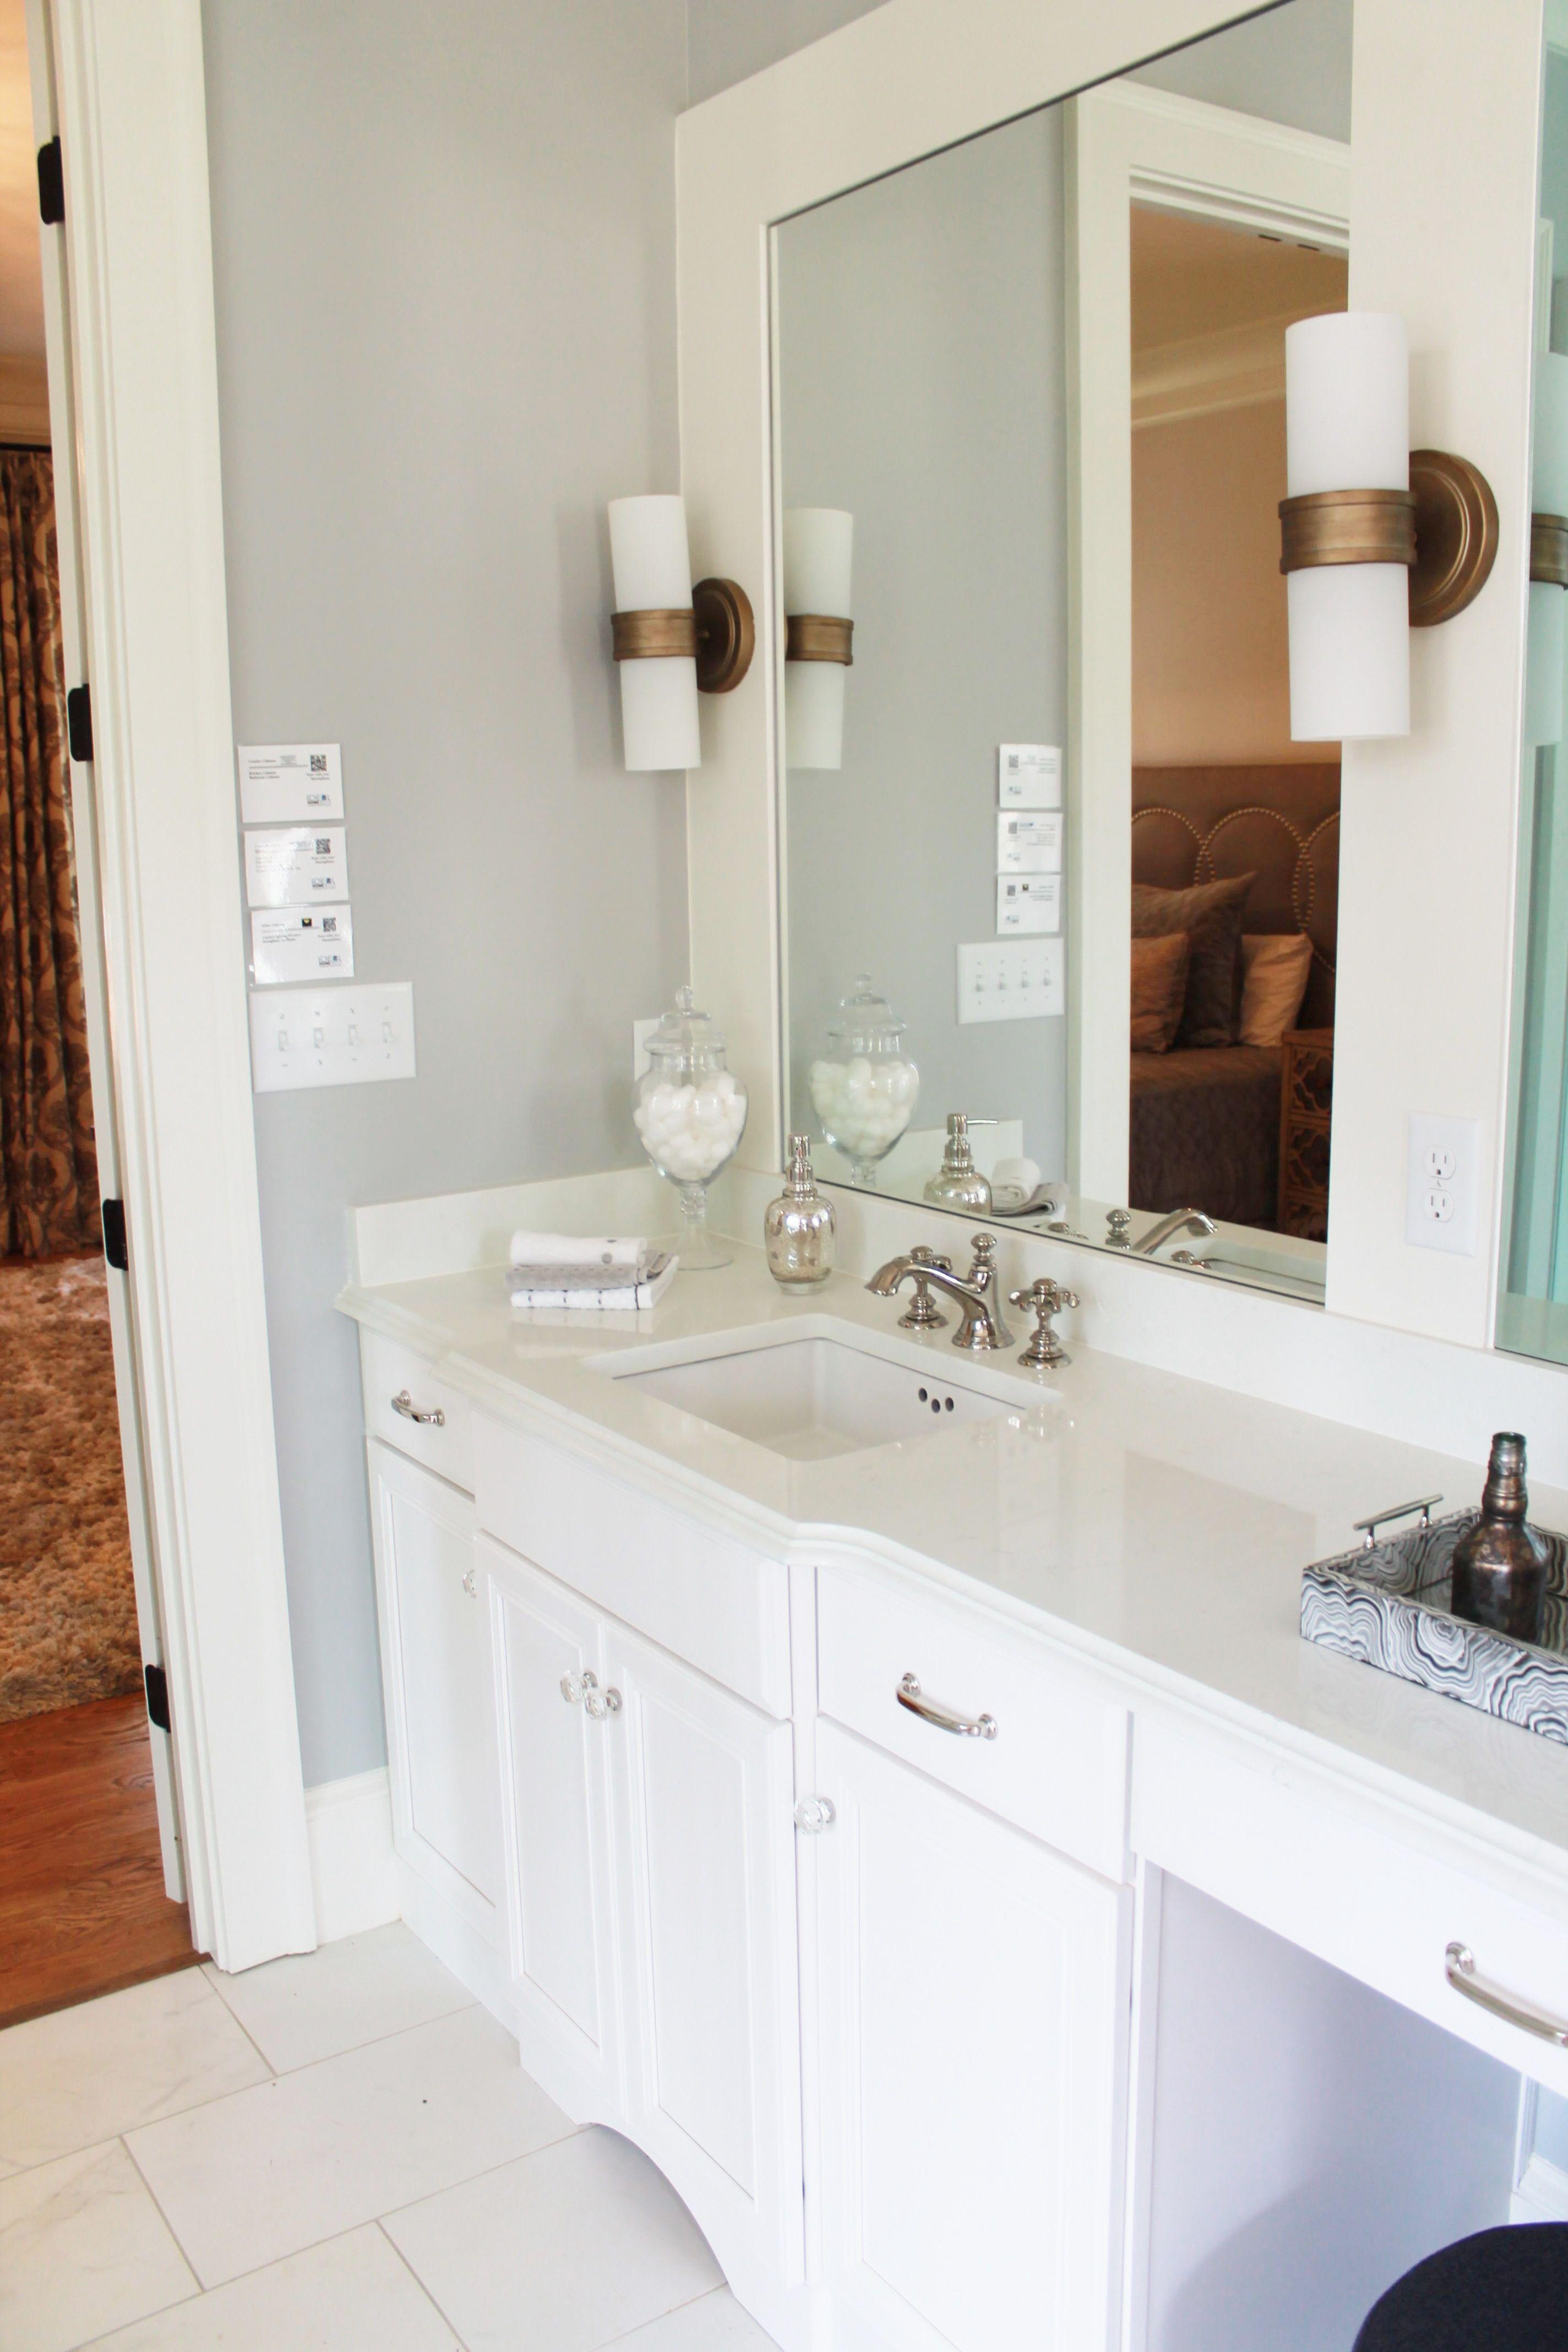 ariel silestone quartz bathroom countertops in 2015 gbahb ideal home installed by surface one of birmingham - Shaker Bathroom 2015